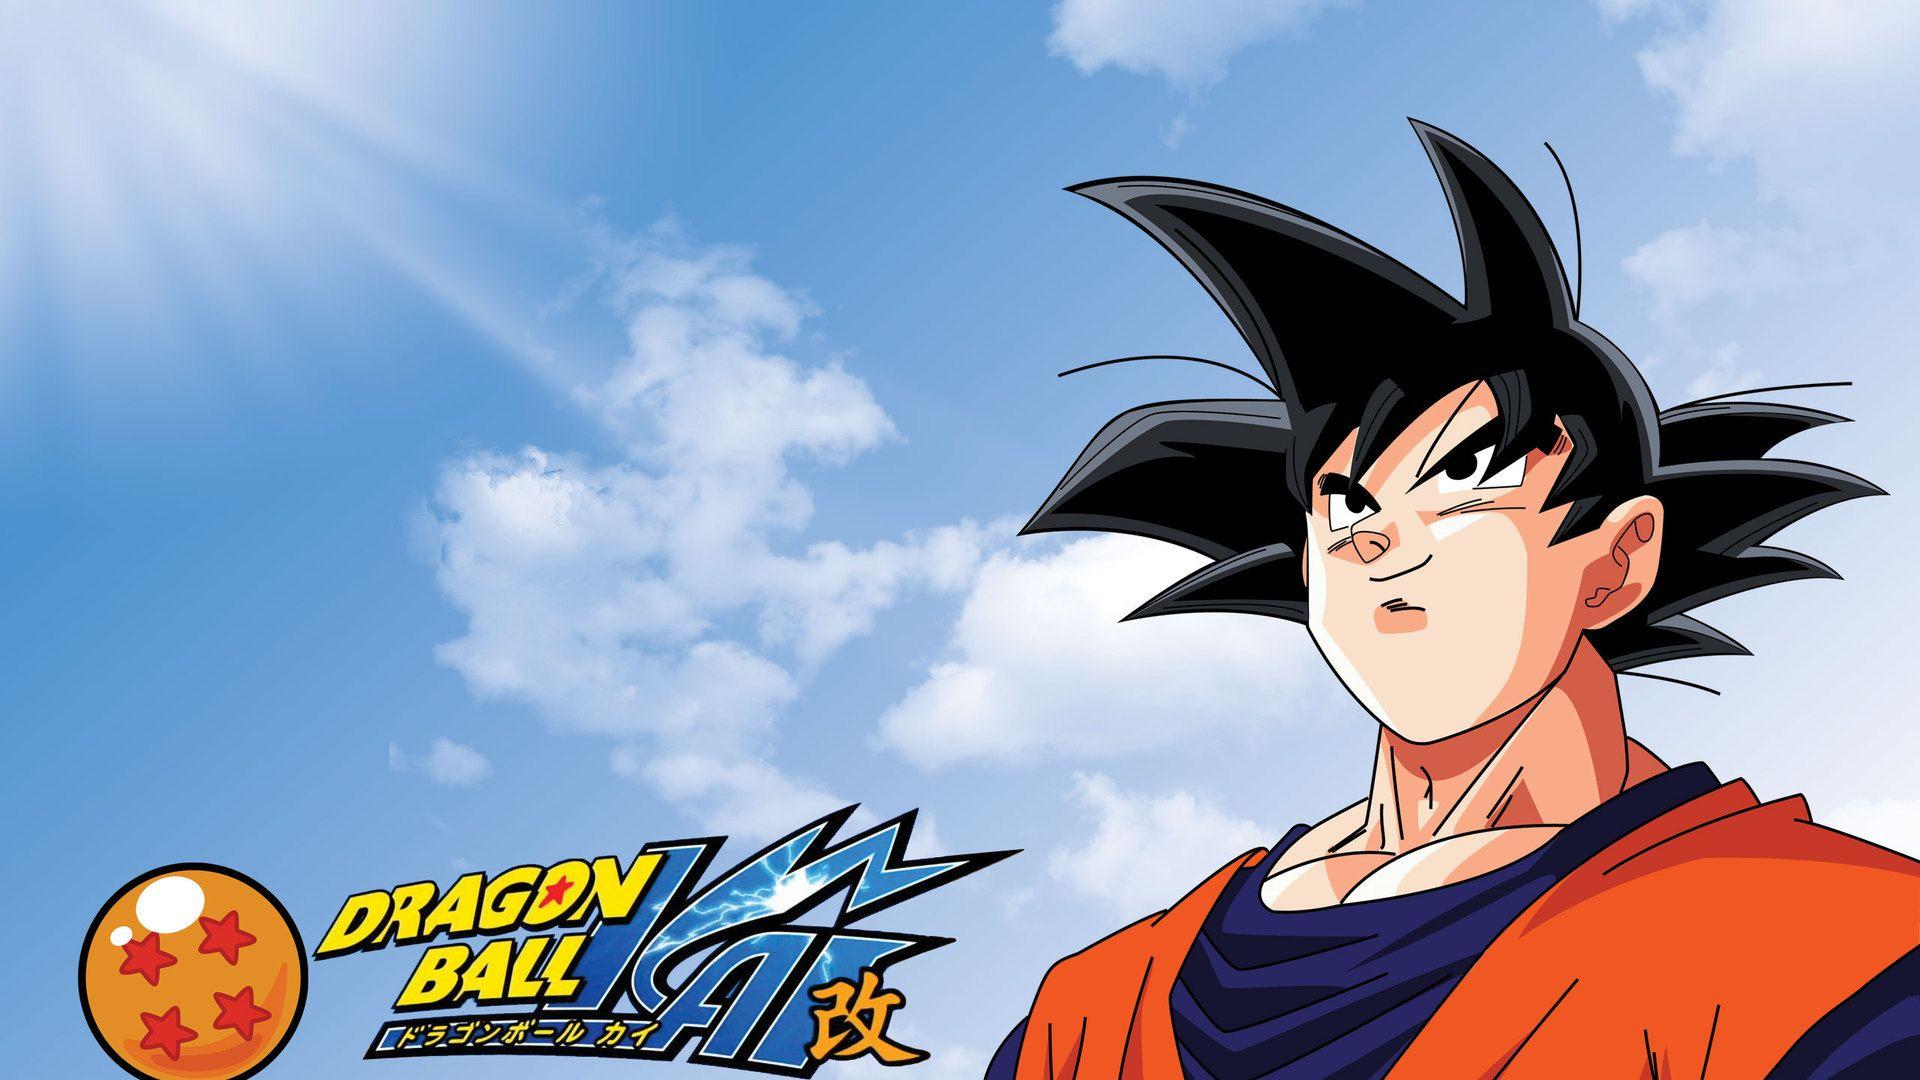 High Resolution Goku Wallpaper Full Size SiWallpaperHD